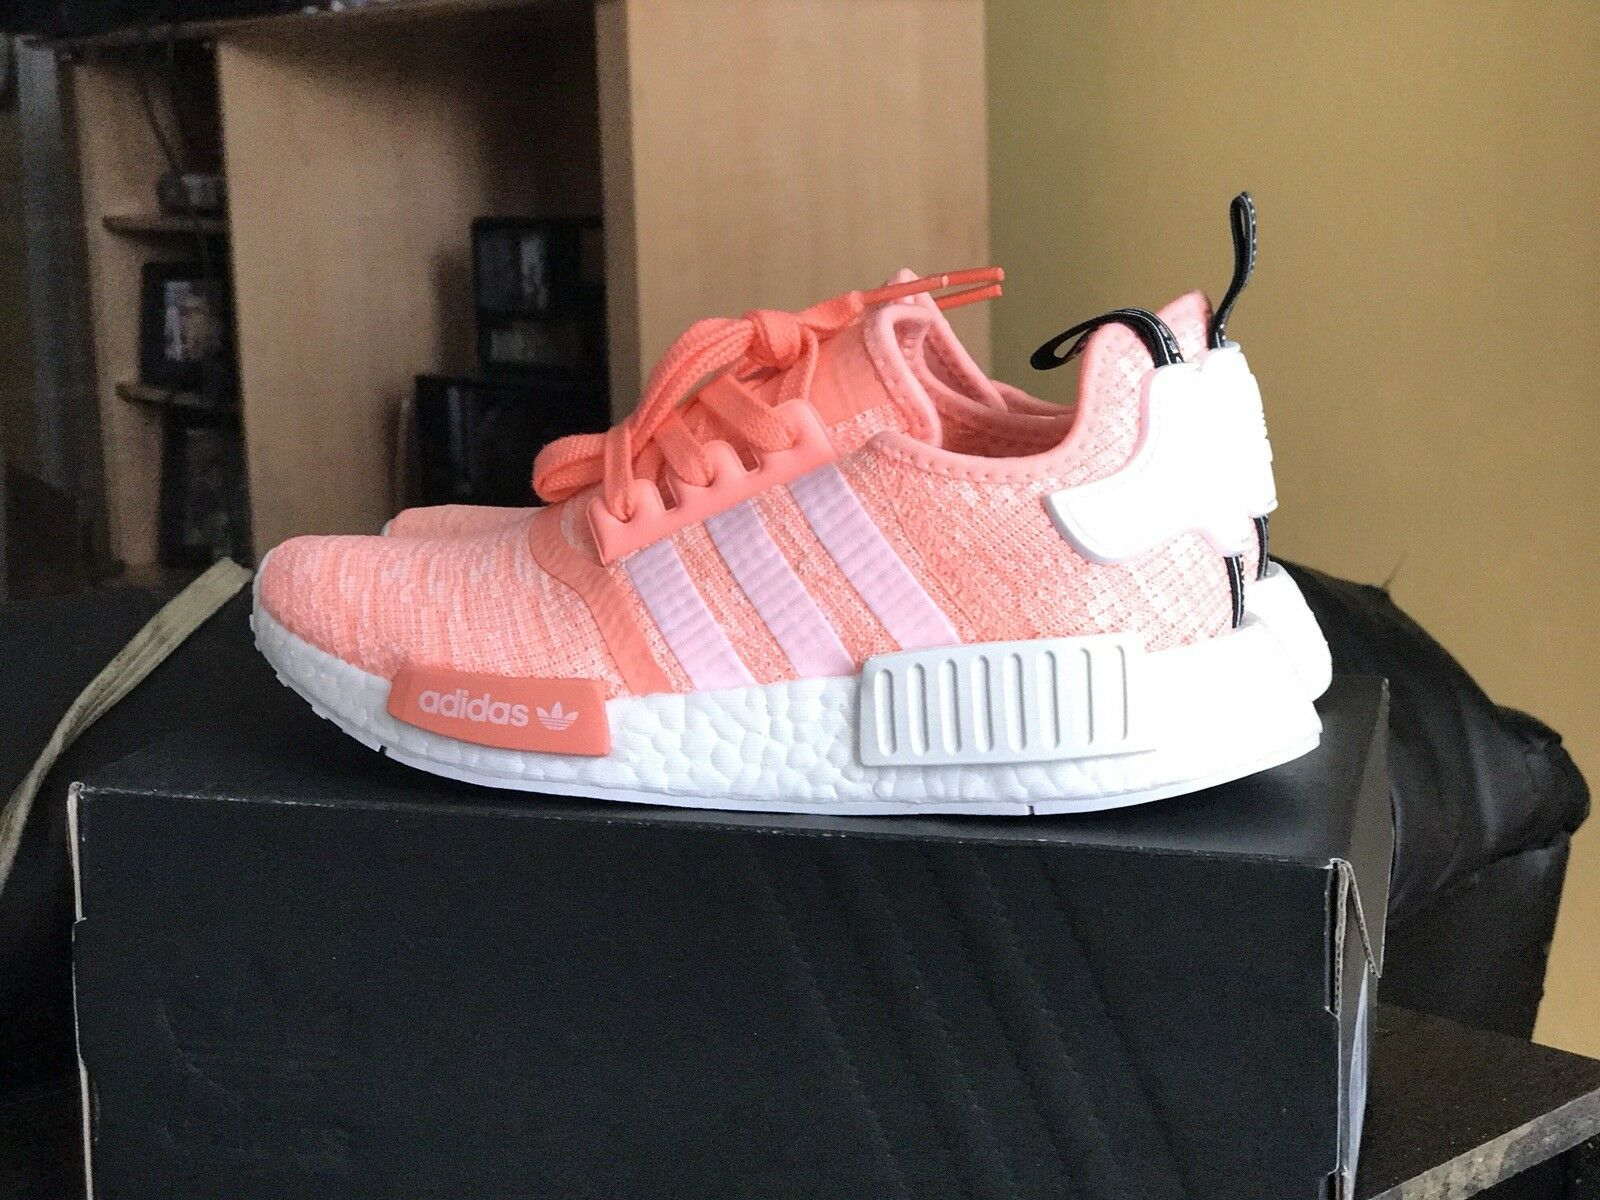 NEW Adidas NMD R1 W Sun Glow Pink Peach Coral Glitch BY303. US 5.5